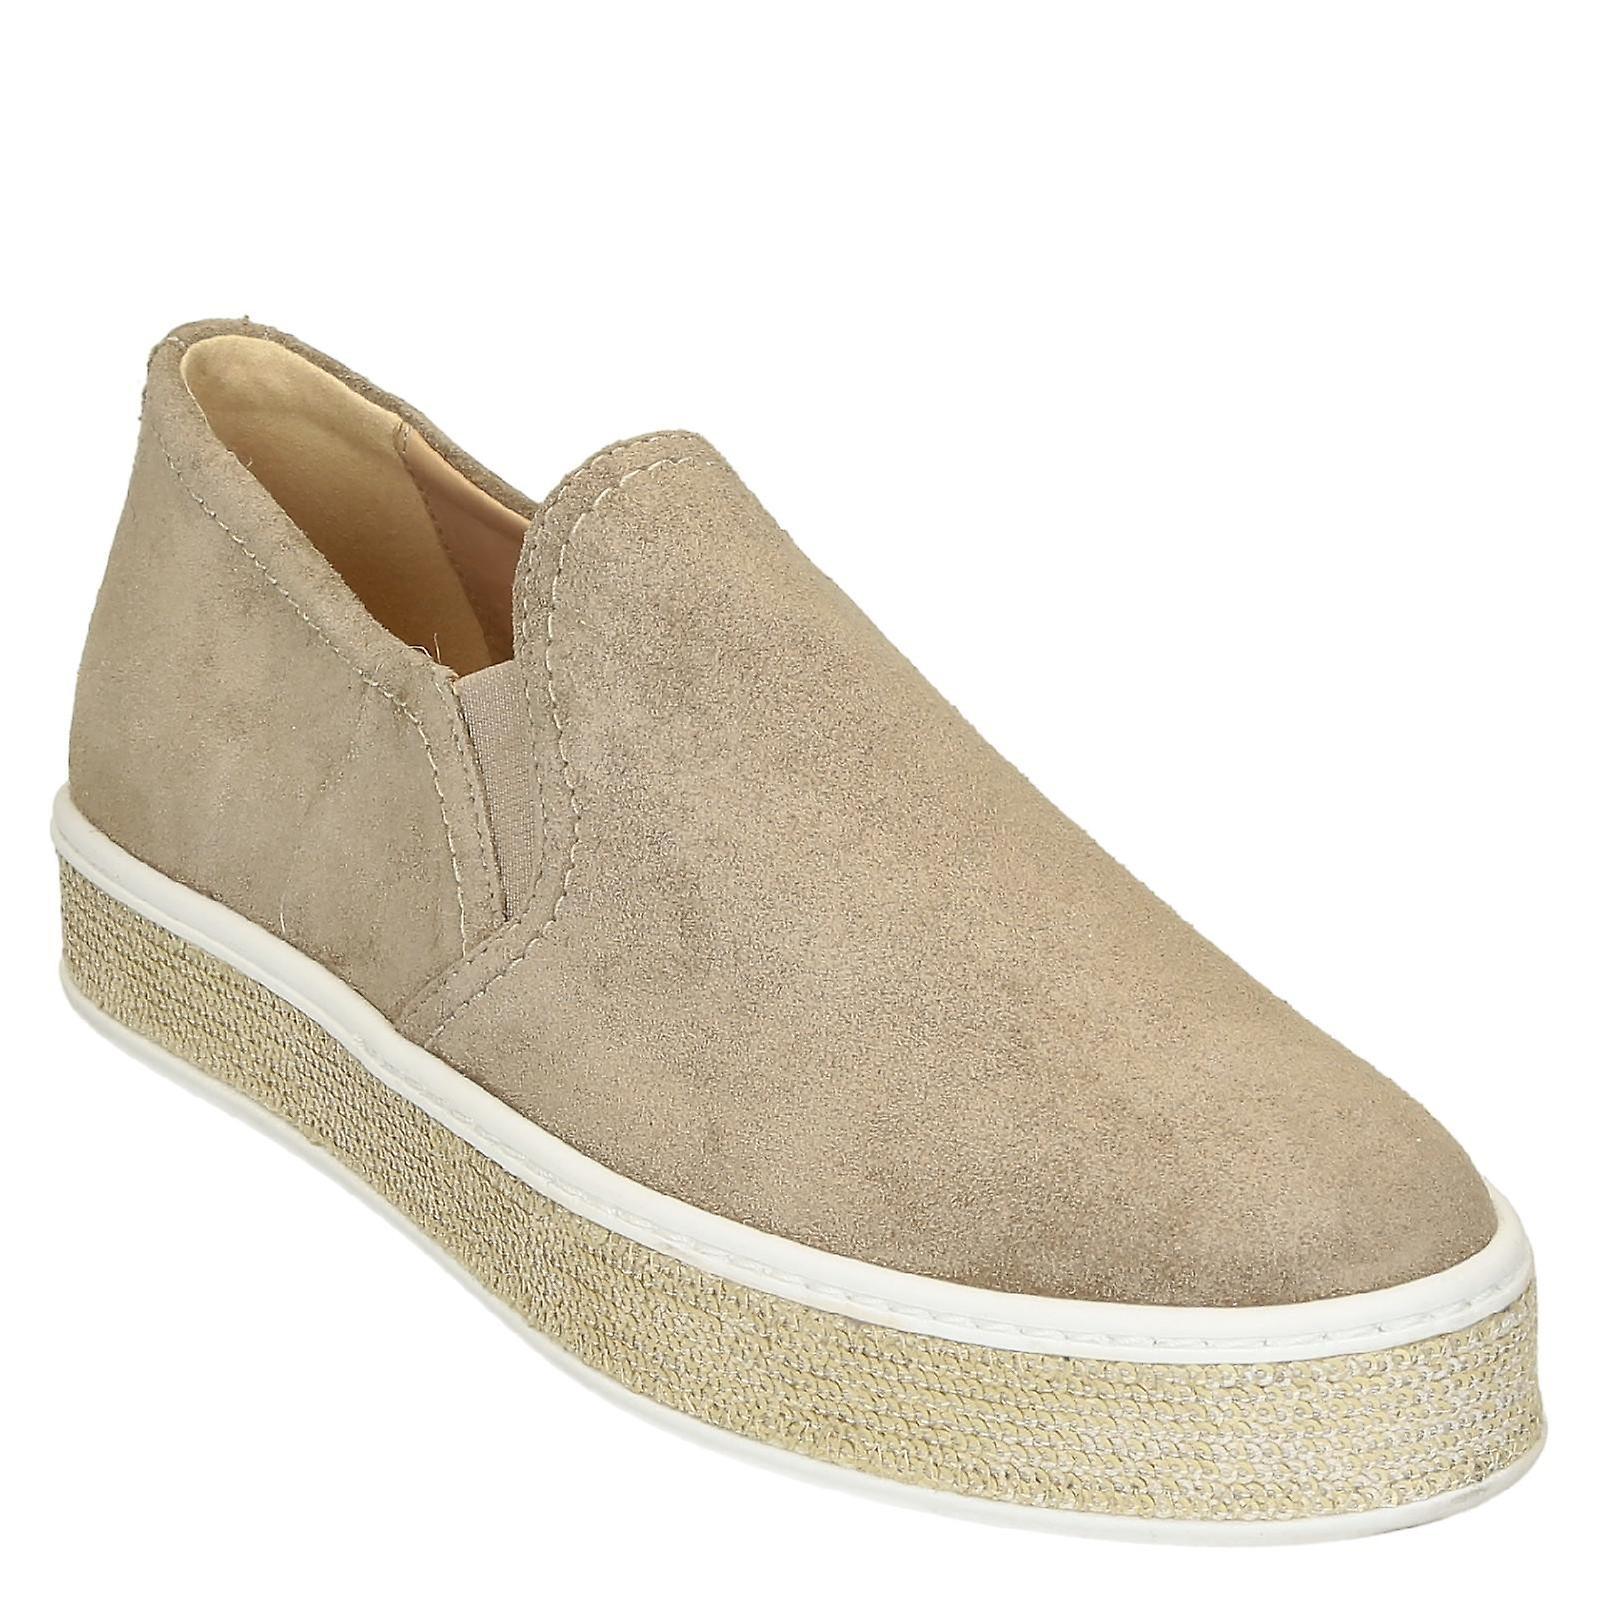 Beige suede slip-ons sneakers with gold paiette platform HUaA8